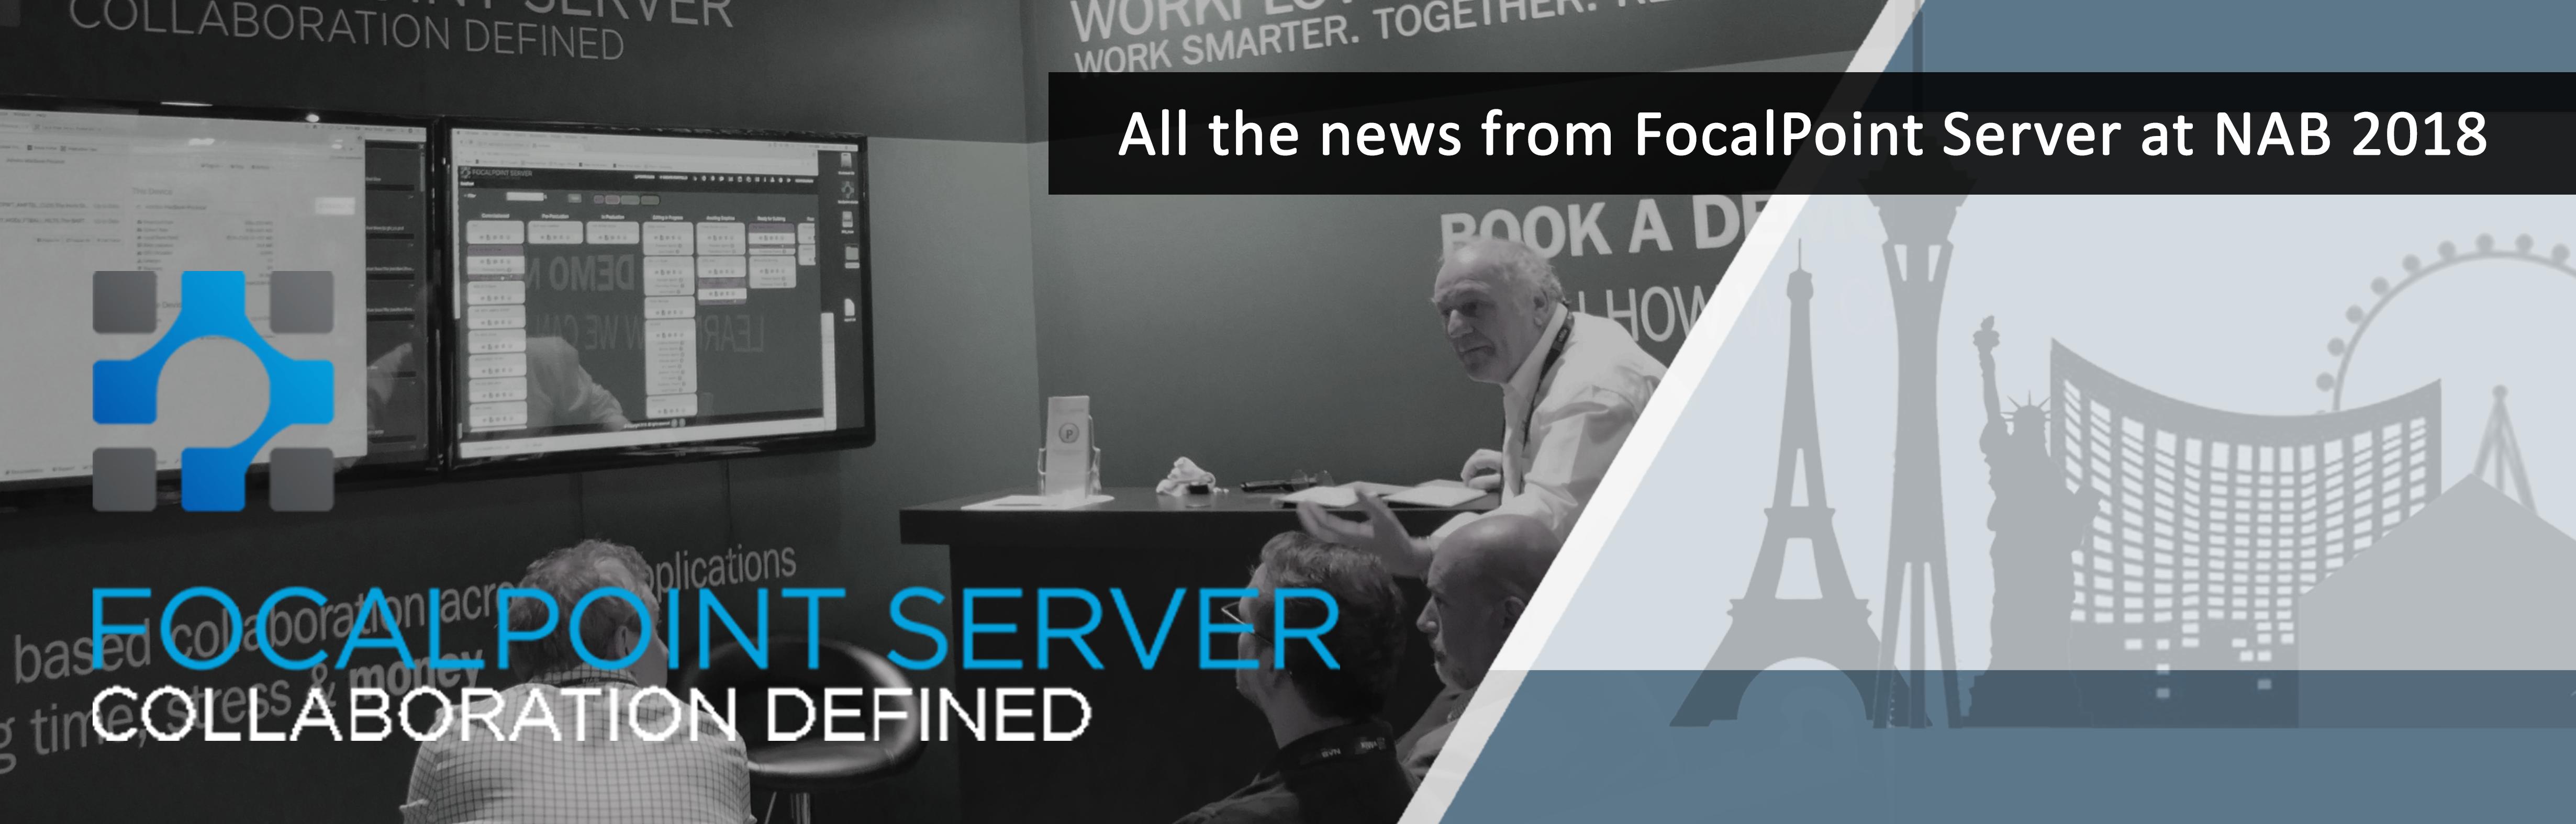 Post NAB 2018 News From FocalPoint Server_Header